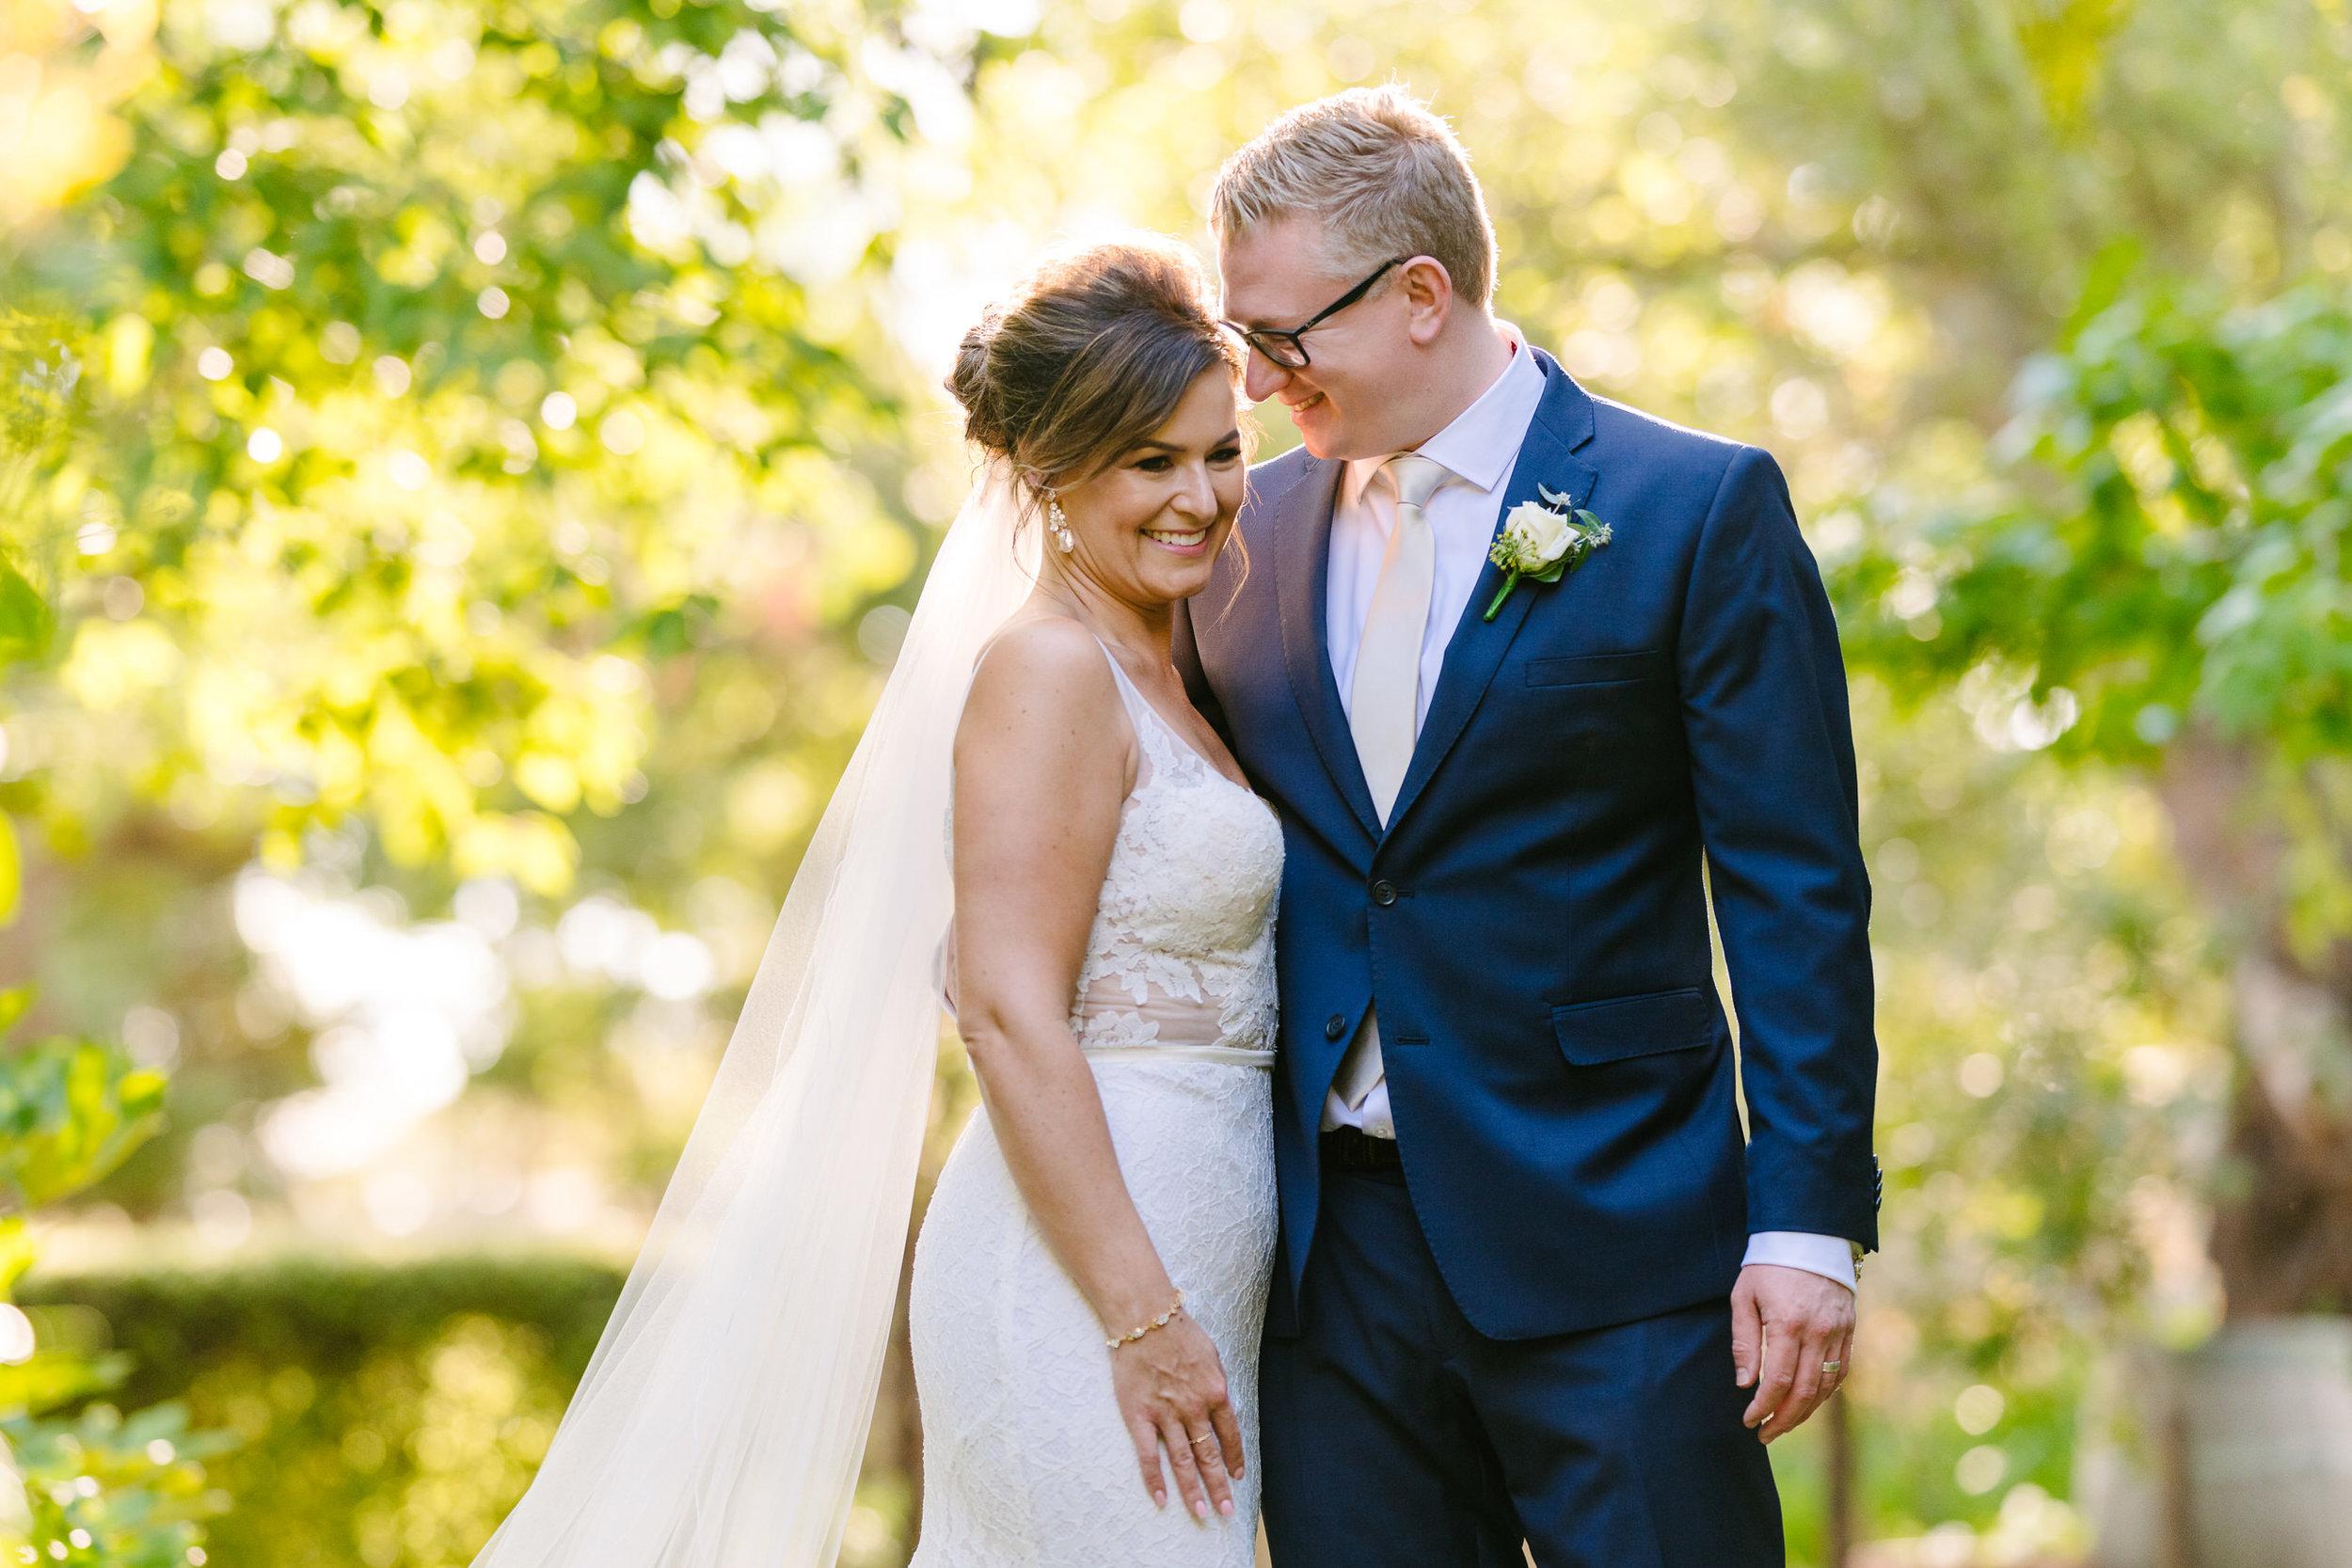 Justin_And_Jim_Photography_Chateau_Dore_Bendigo_Wedding54.JPG